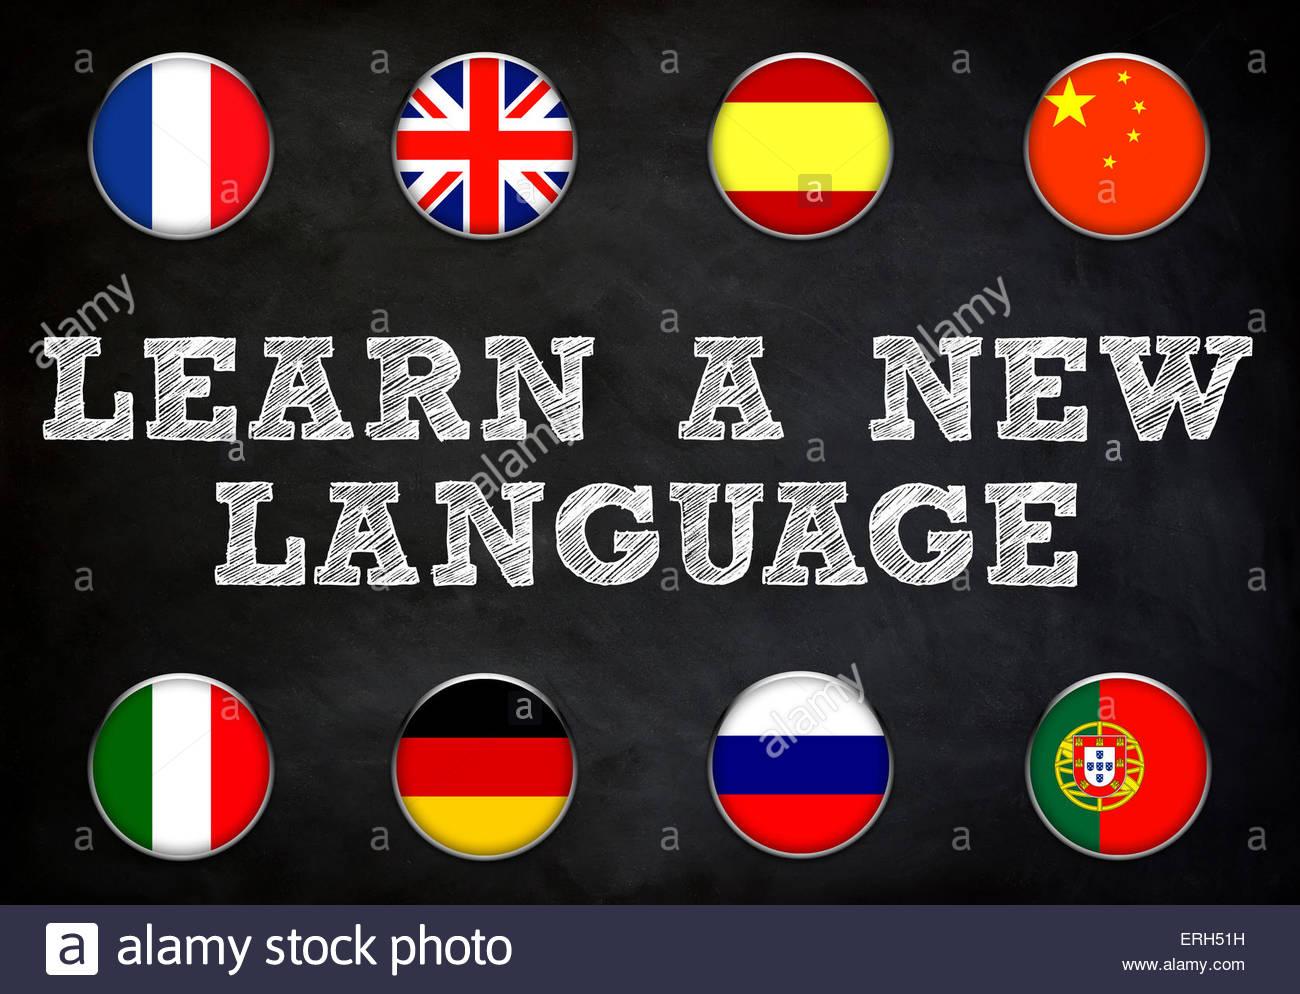 Lerne eine neue Sprache - Tafel Abbildung Stockbild